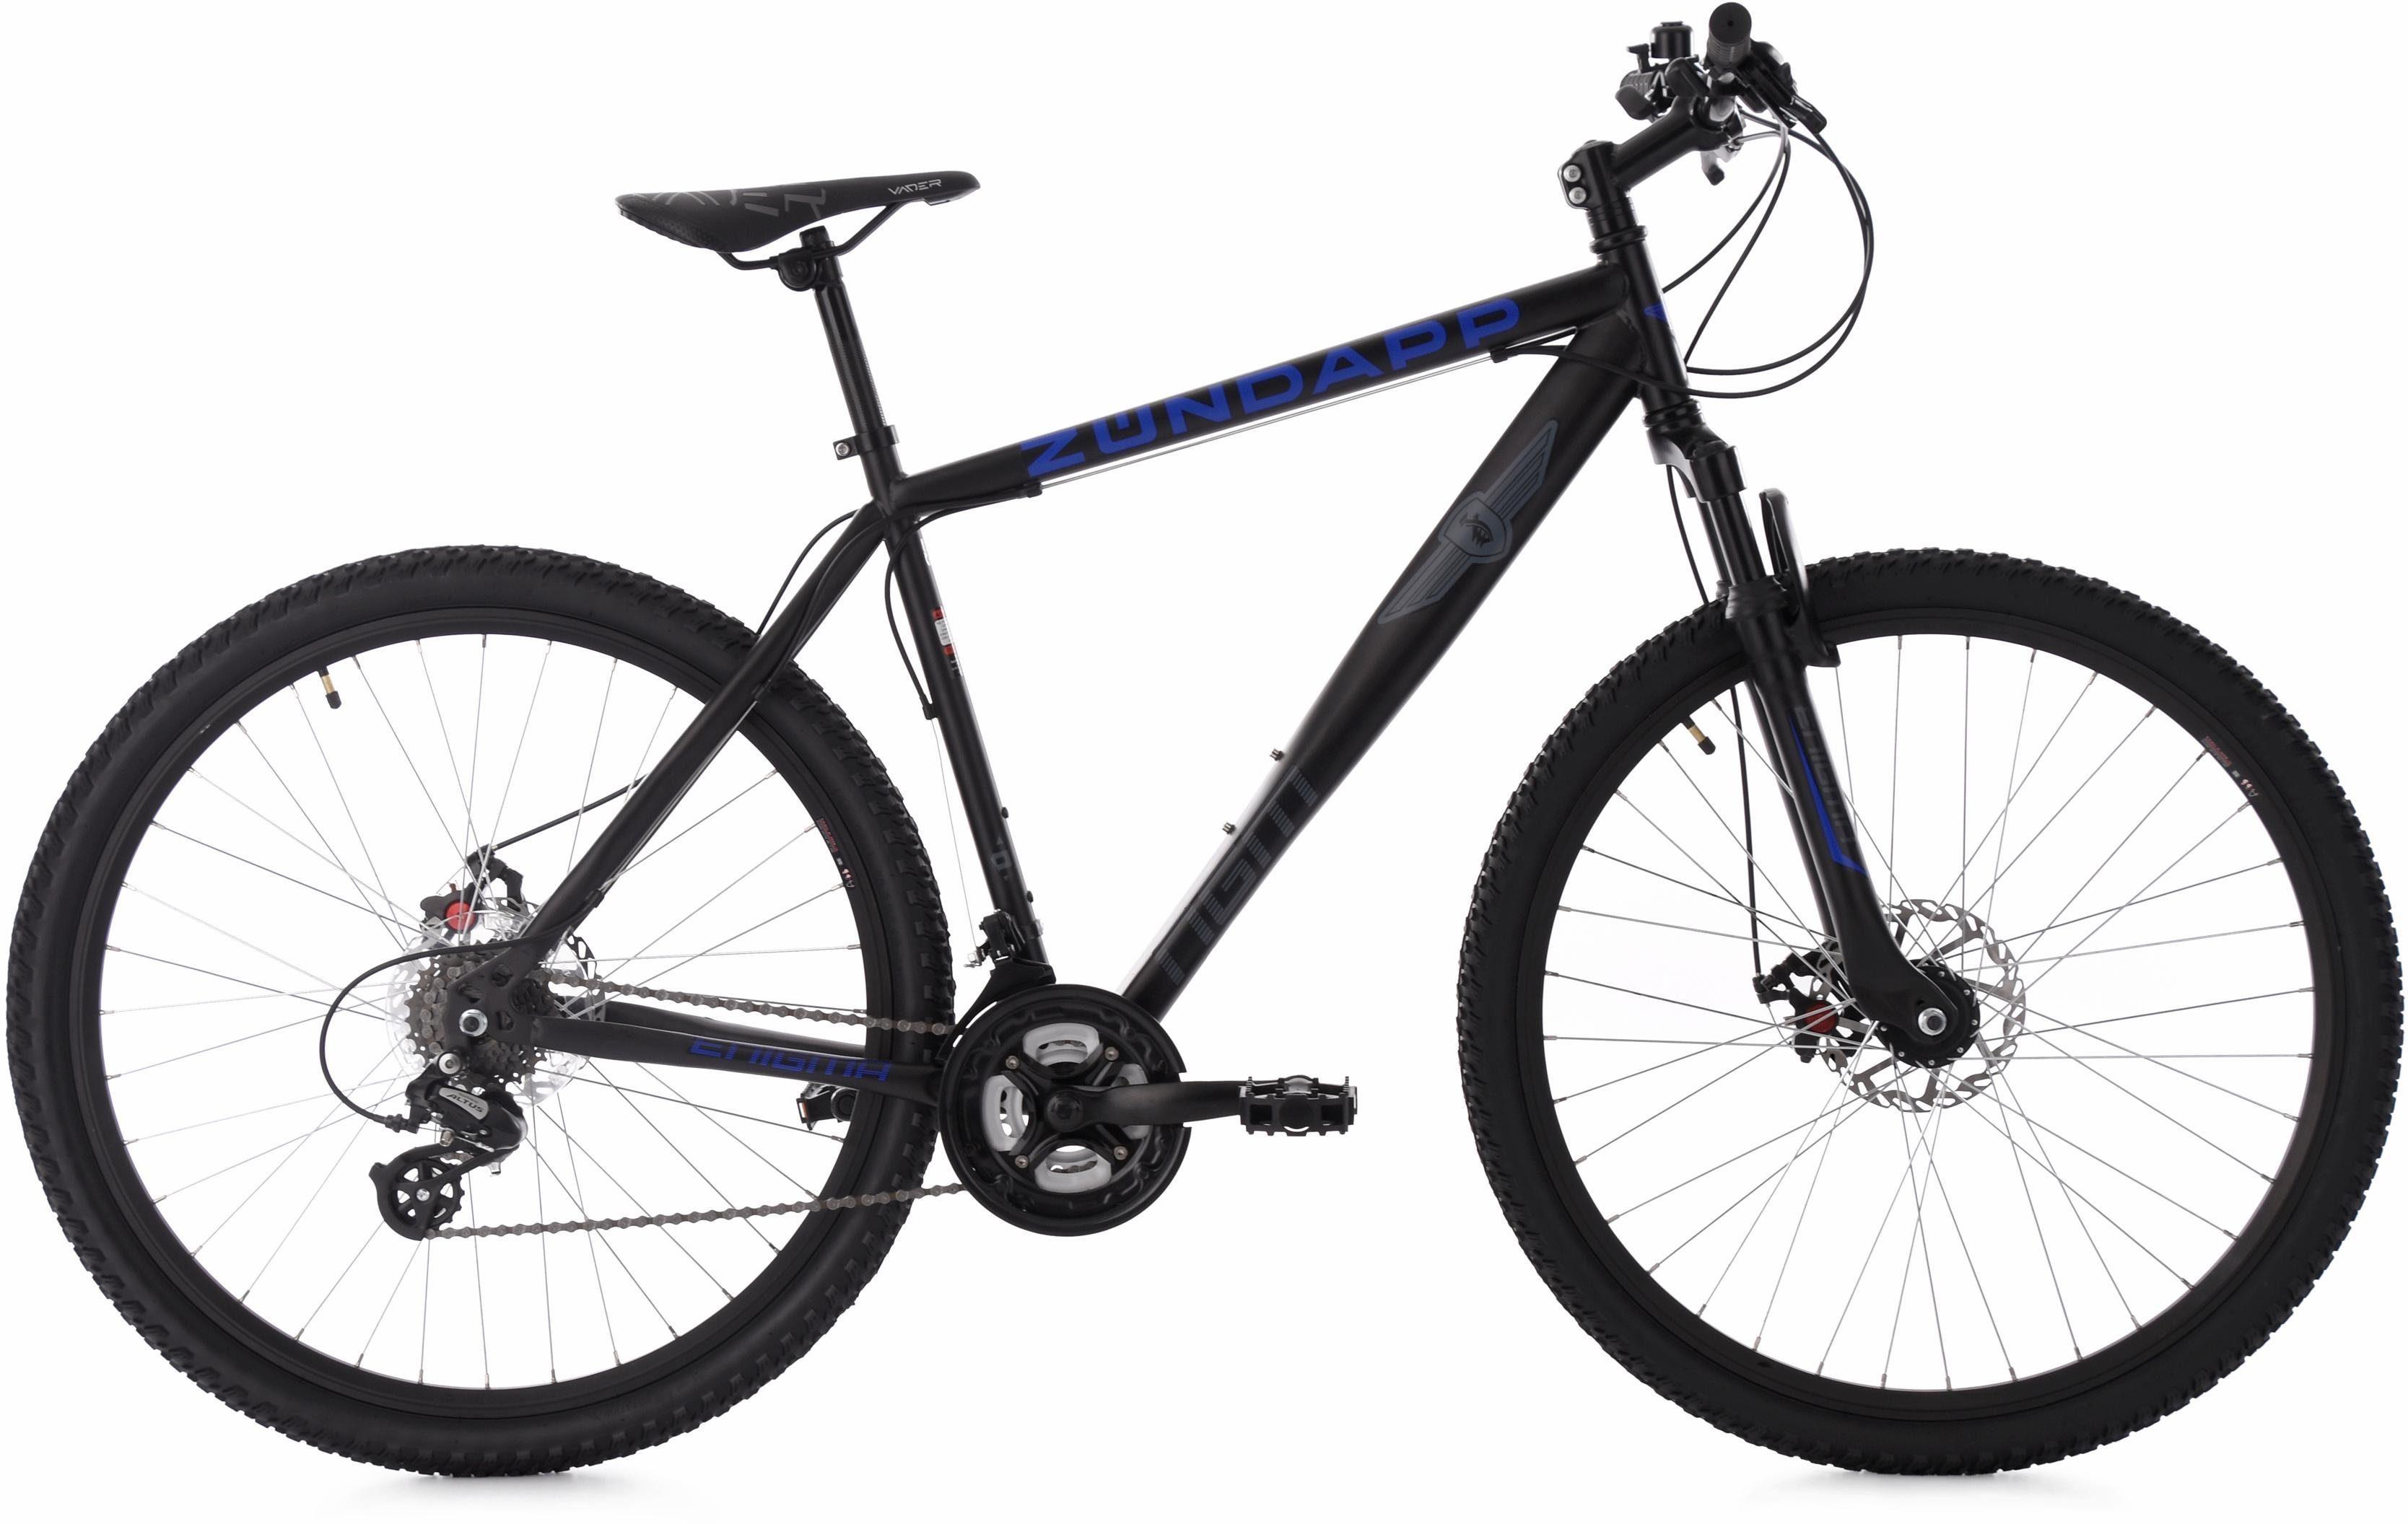 Zündapp Mountainbike »Enigma«, 24 Gang Shimano Altus Schaltwerk